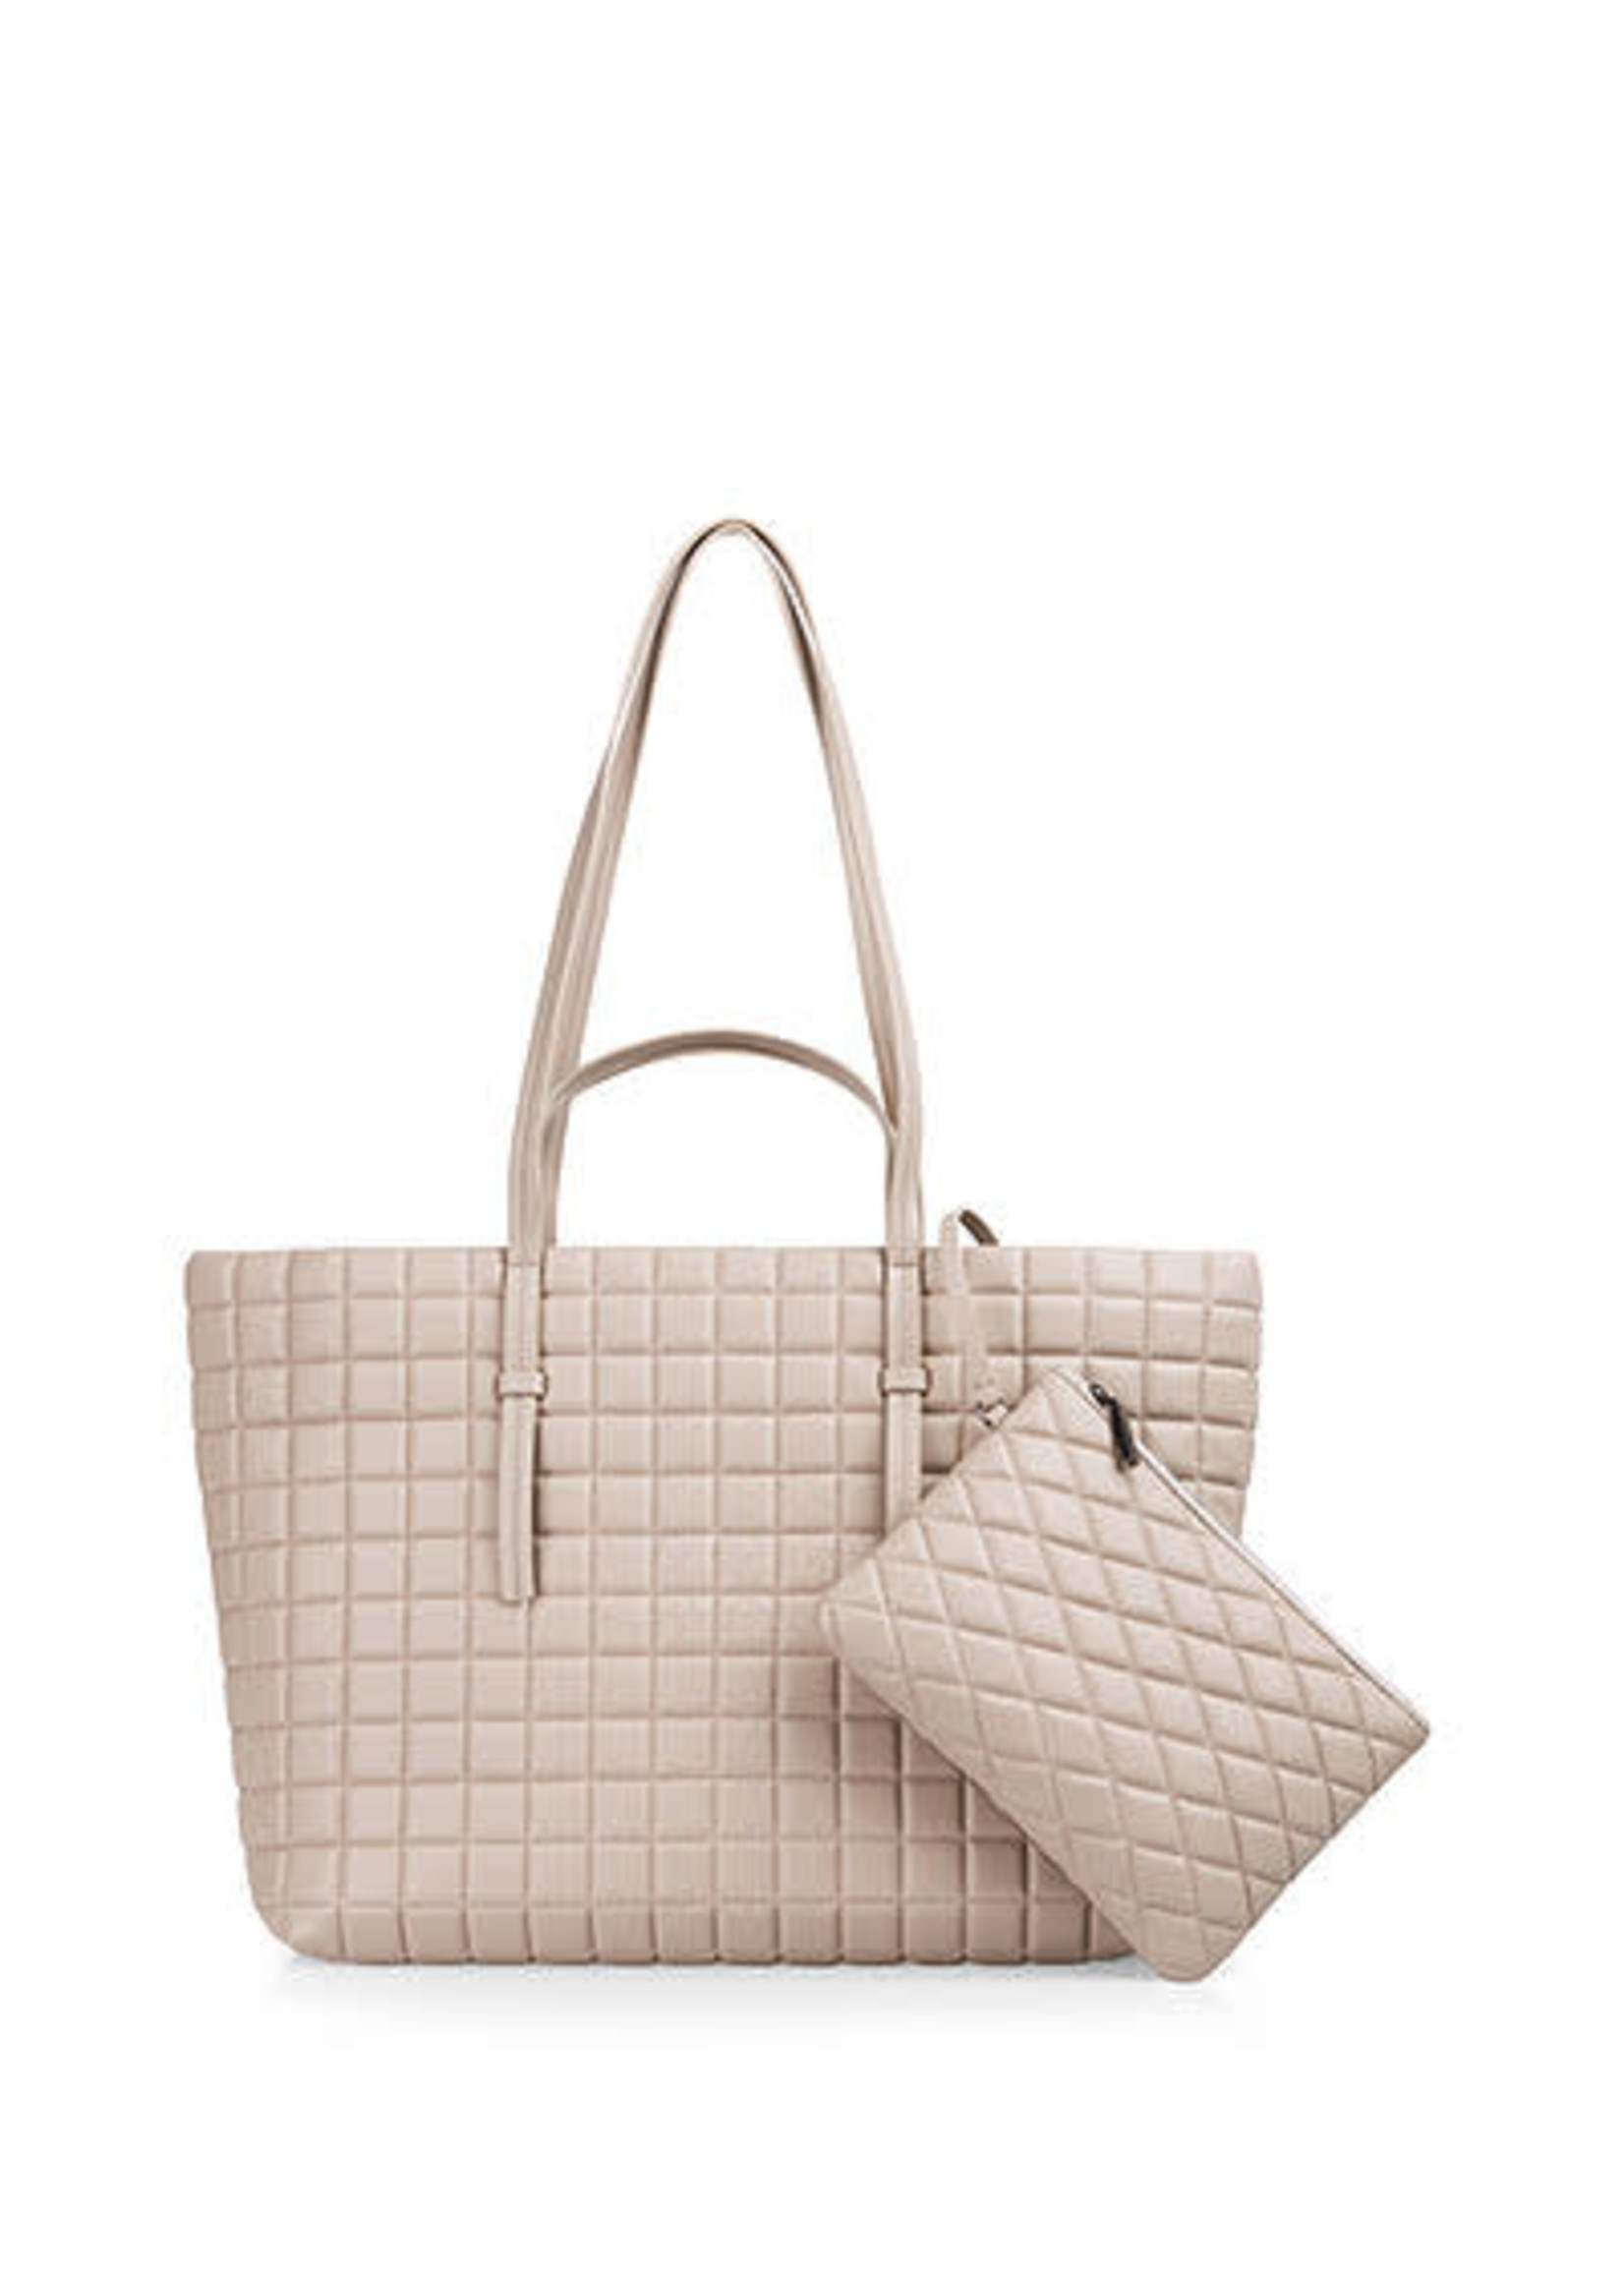 Marccain Bags & Shoes Shopper RB T6.10 Z05 warm stone